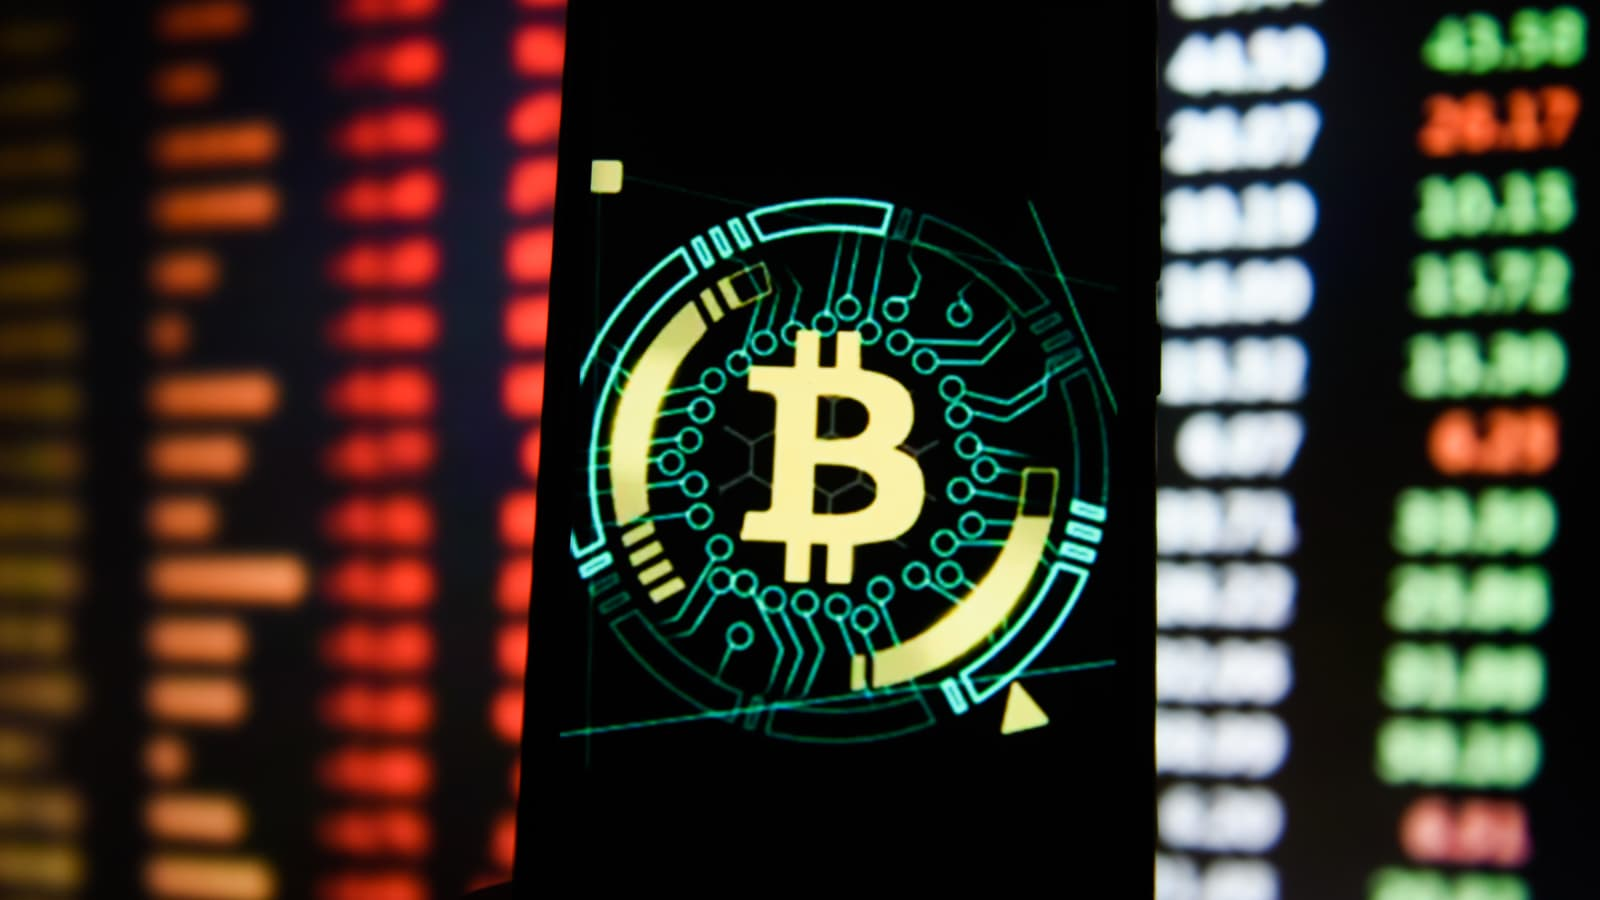 28 million bitcoins seized vehicle badminton sport information betting